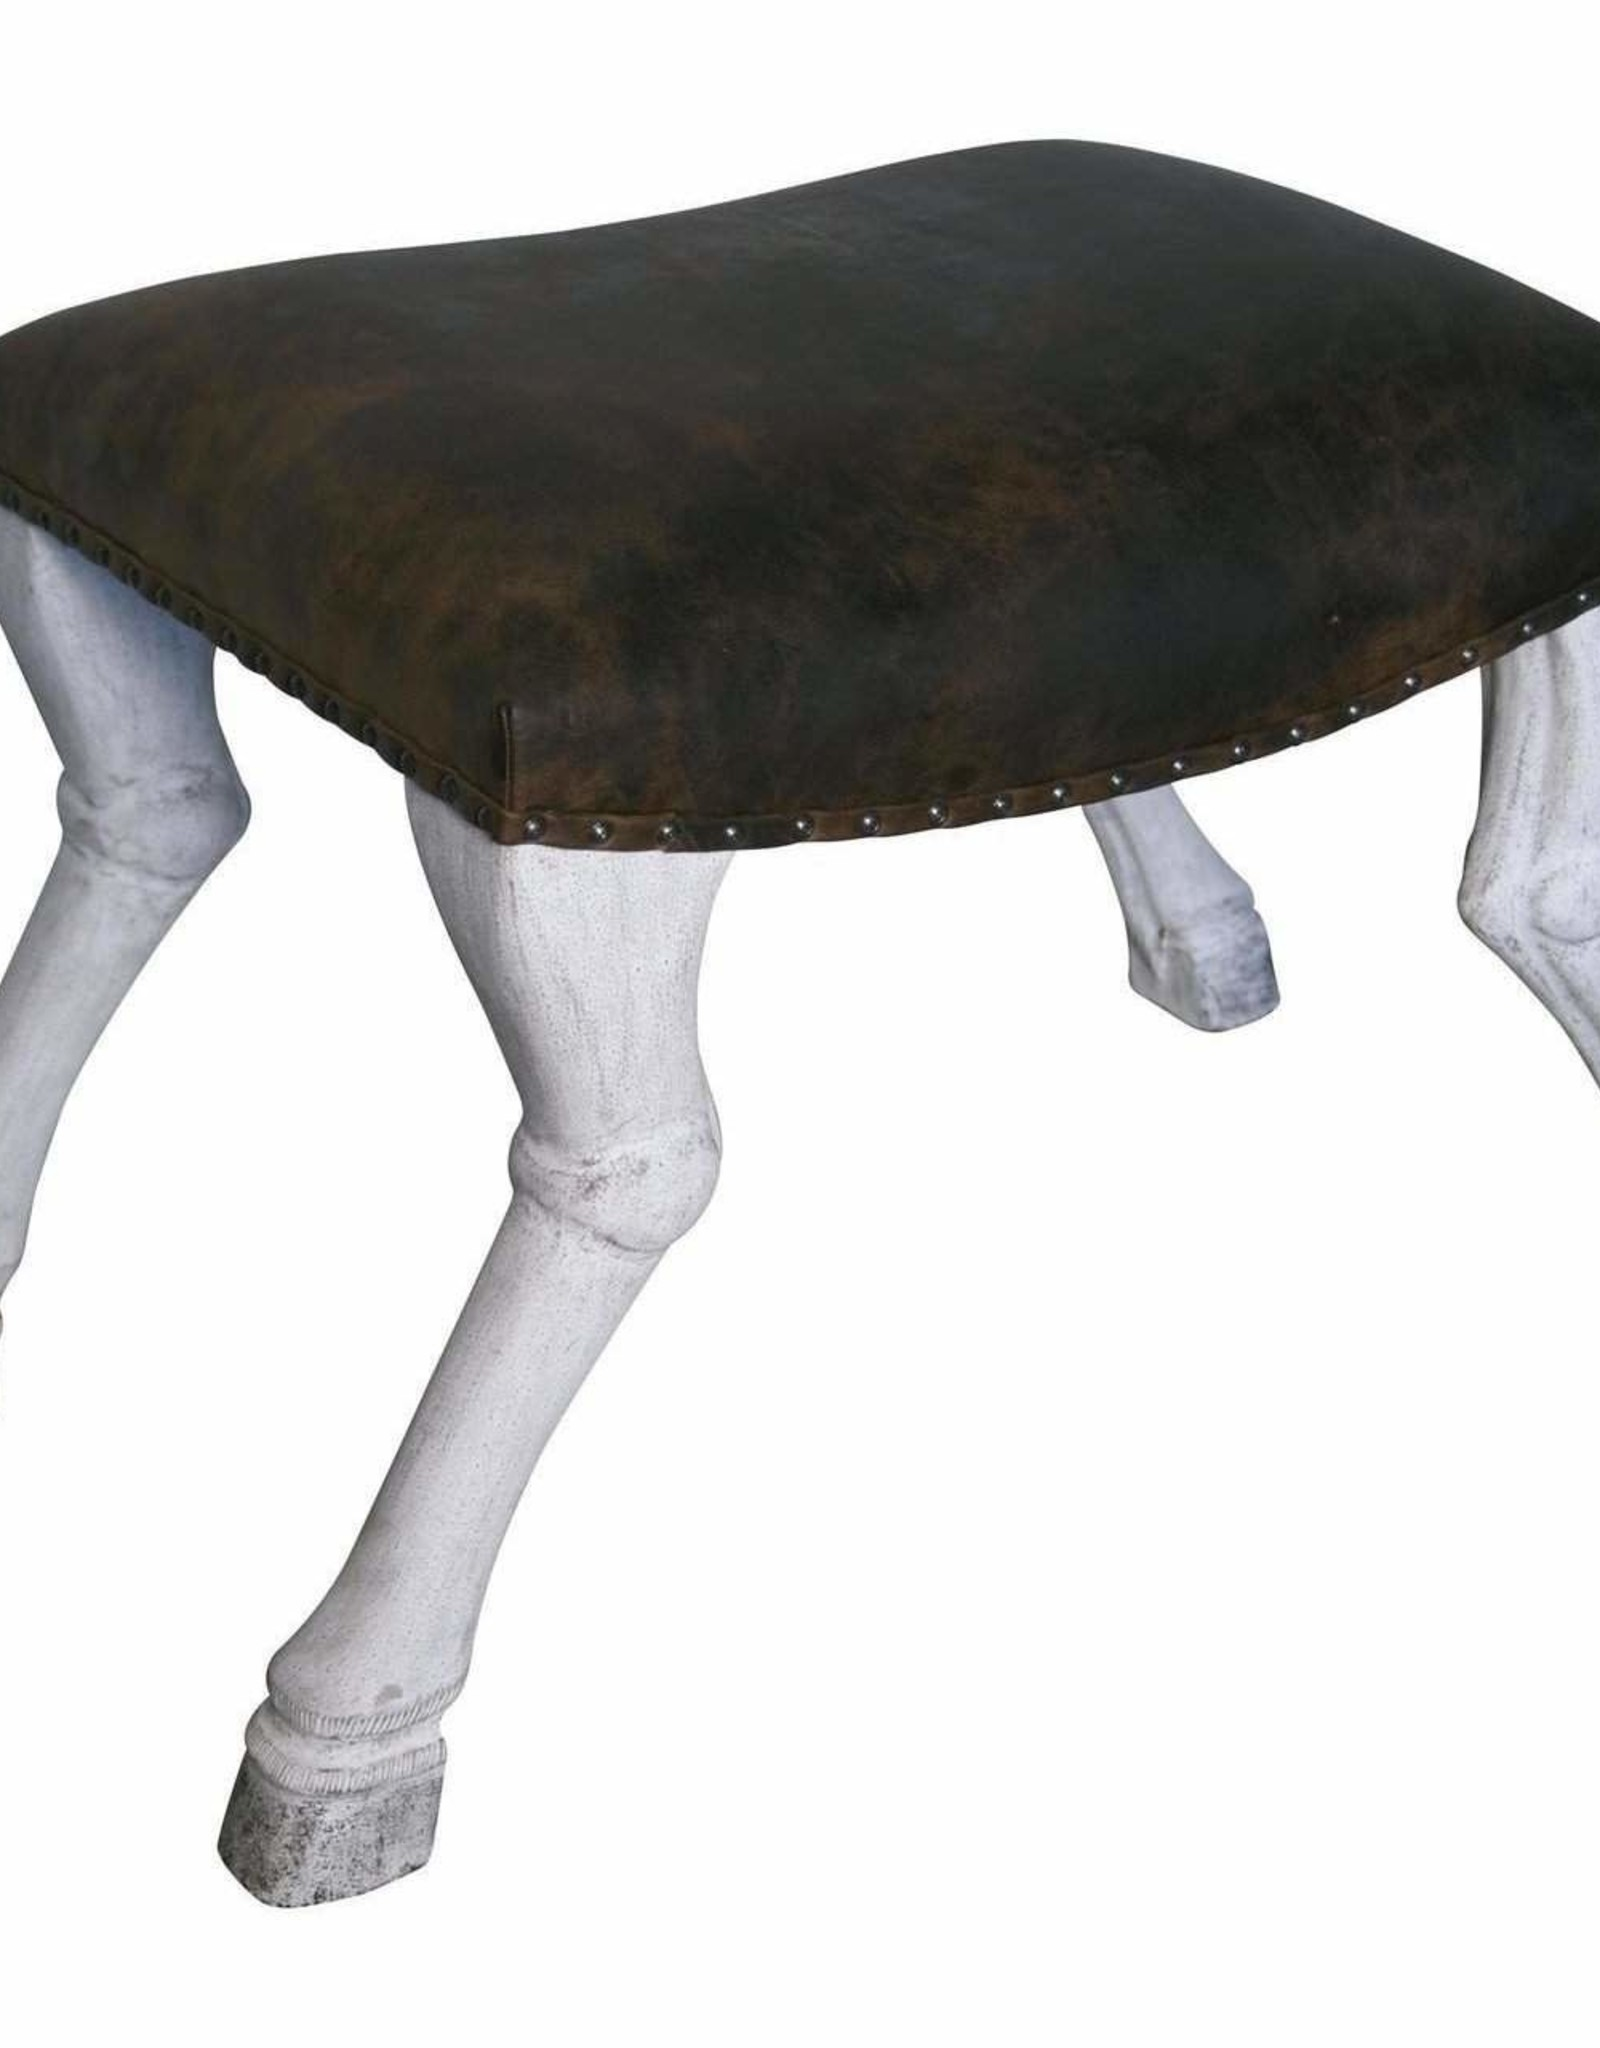 Website Noir Claw Leg Saddle Stool w/ Leather